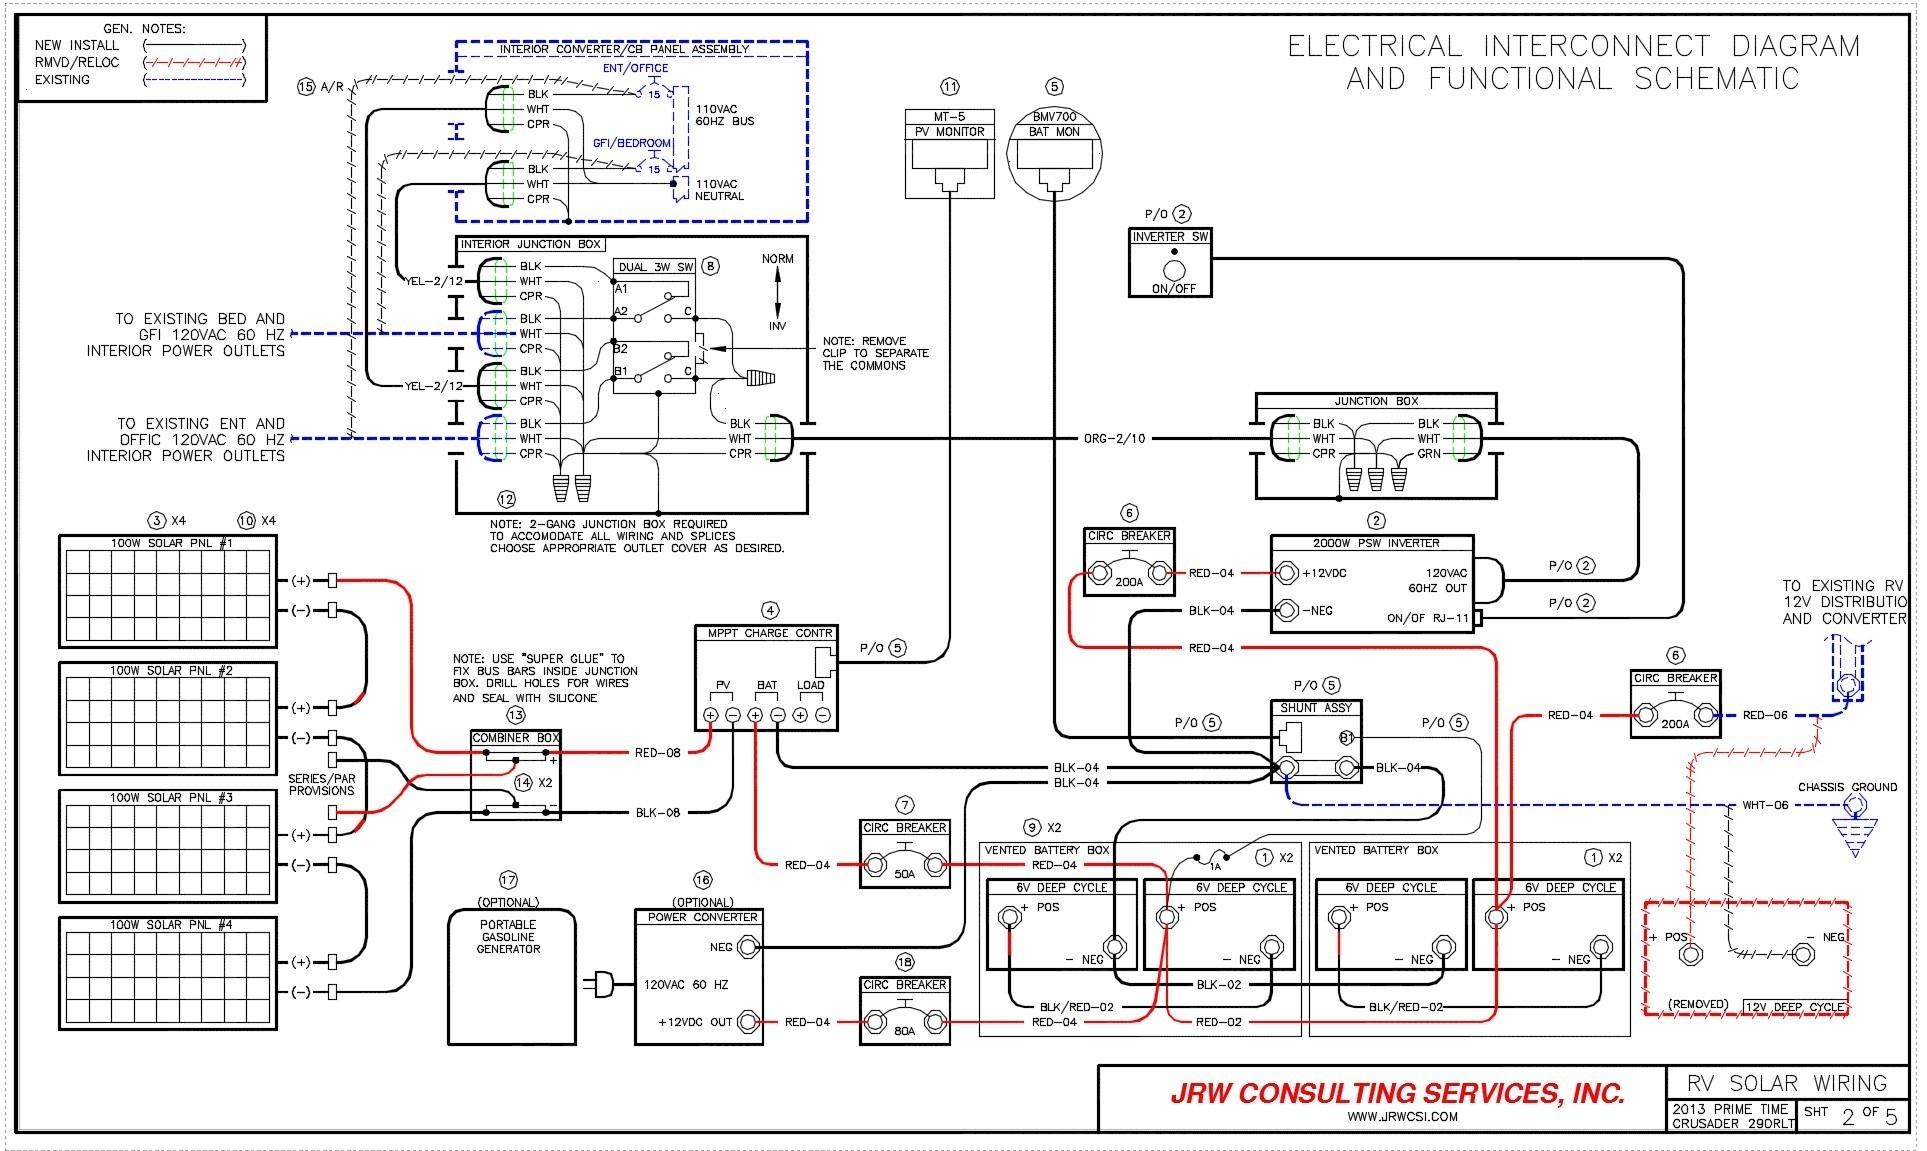 monaco rv wiring diagram Download-monaco rv wiring diagram Download Rv Electrical Wiring Diagram Thoritsolutions 1 j DOWNLOAD Wiring Diagram Detail Name monaco rv 4-q